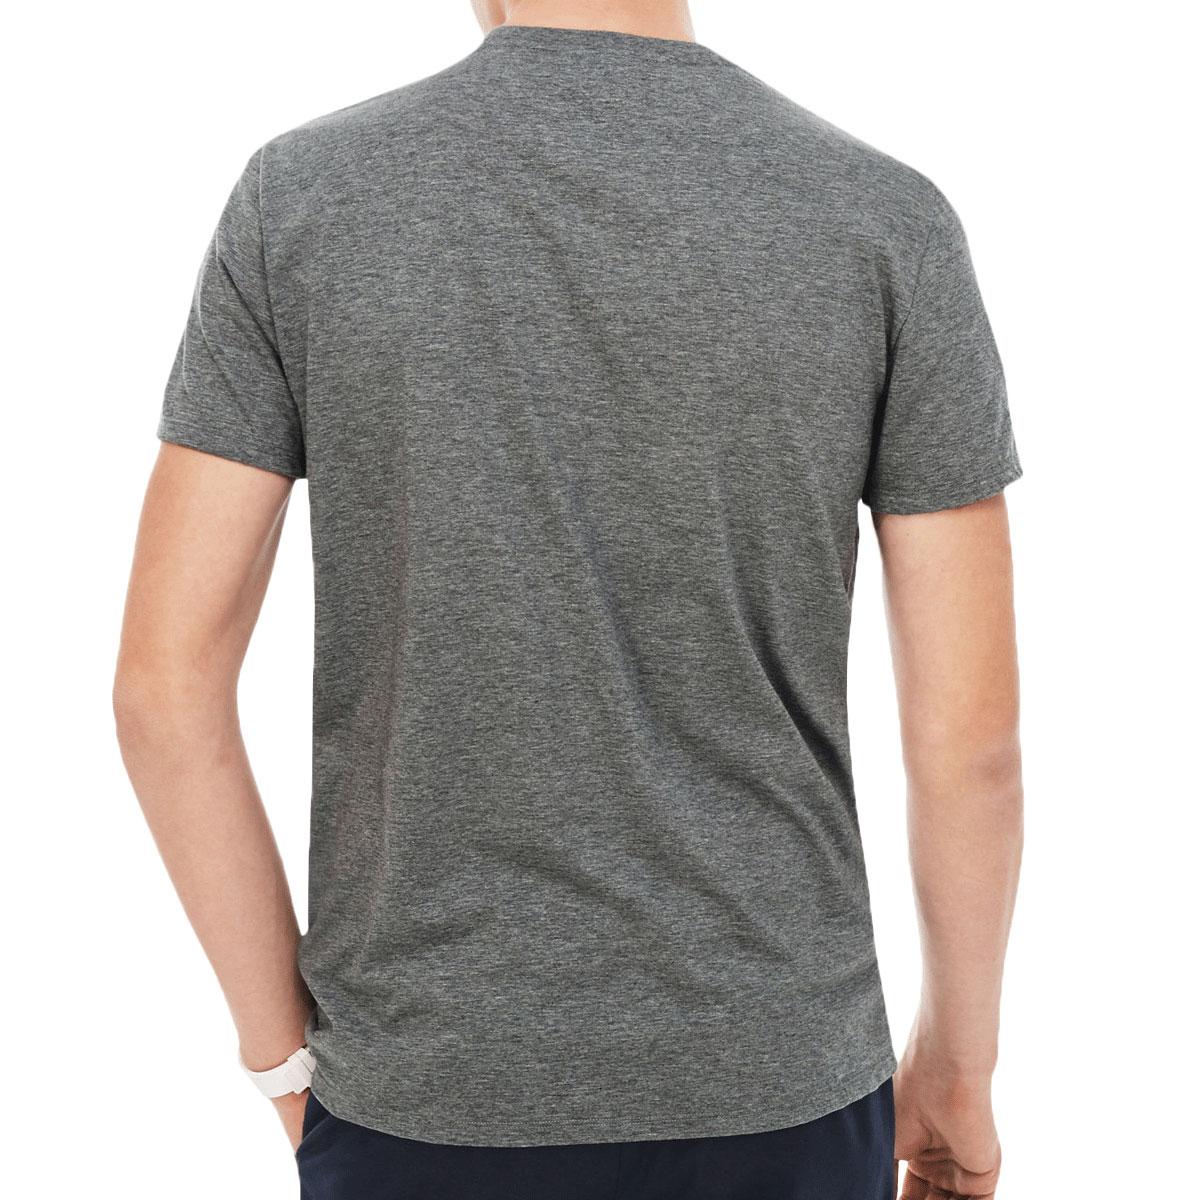 LACOSTE-HOMME-2019-Ss-V-Neck-TH6710-Manches-Courtes-Coton-Pima-Tee-T-Shirt miniature 17